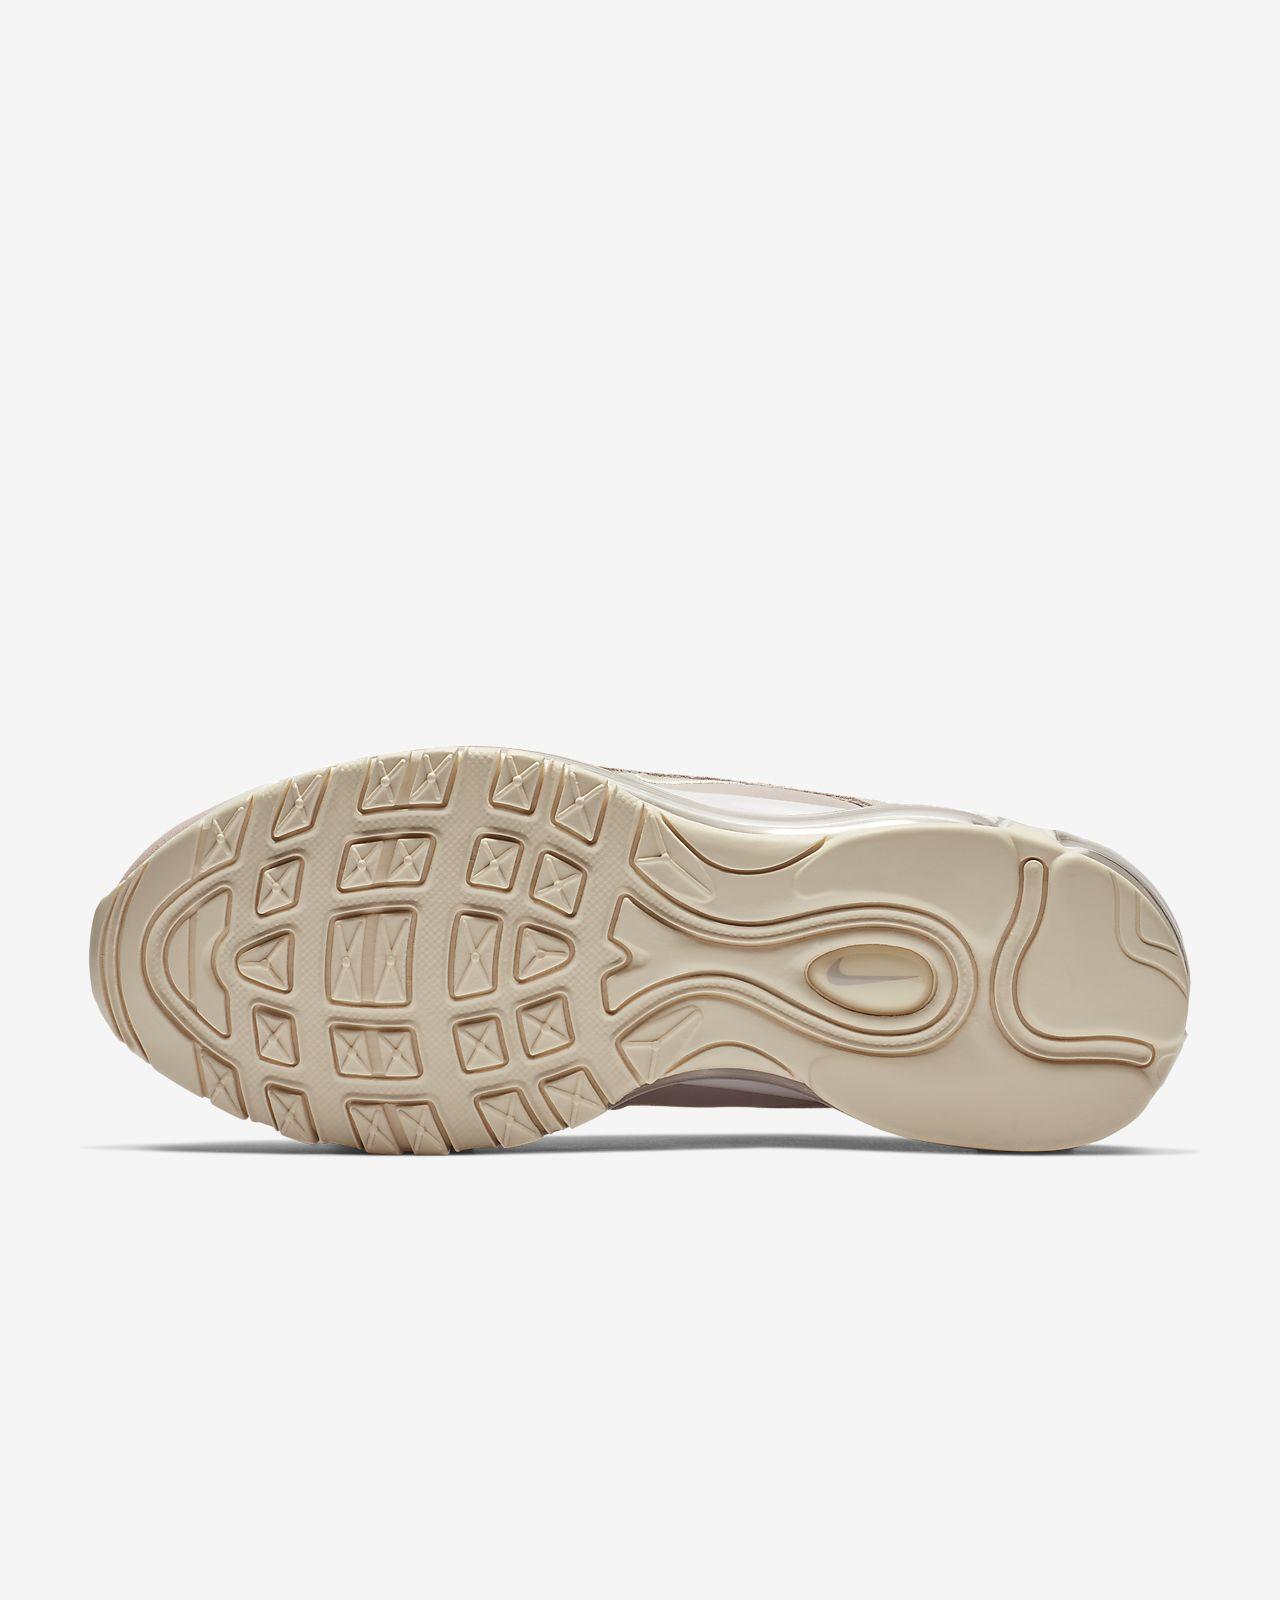 0f204fb1366e3 Nike Air Max 97 Premium Women s Shoe. Nike.com GB